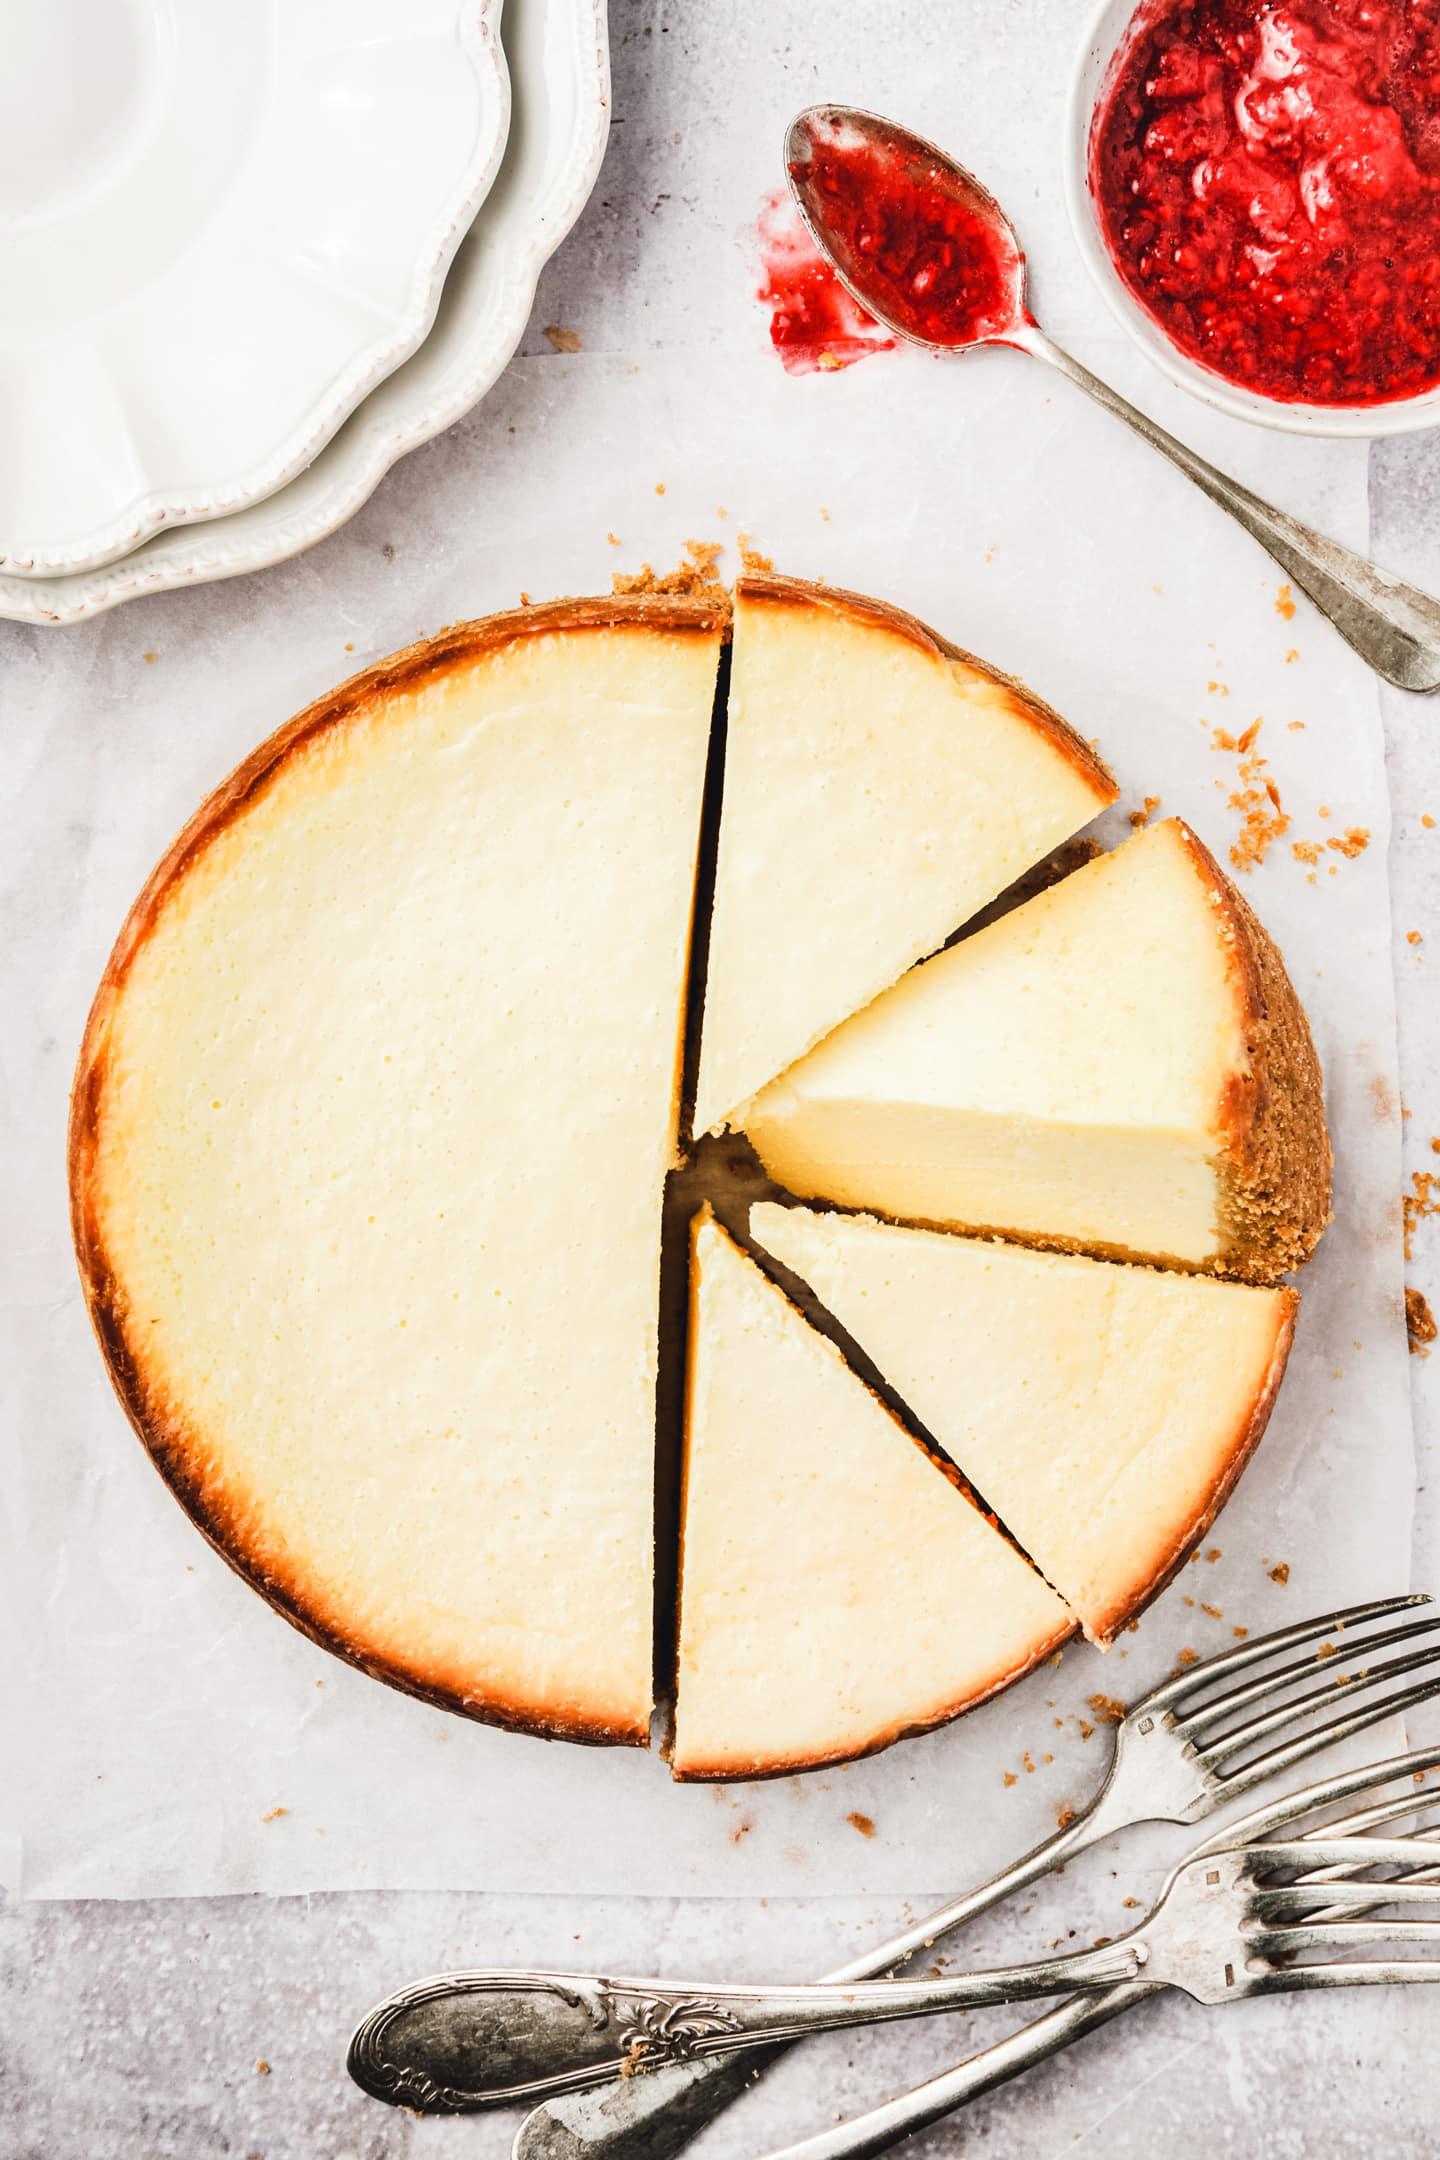 Recette du New york cheesecake